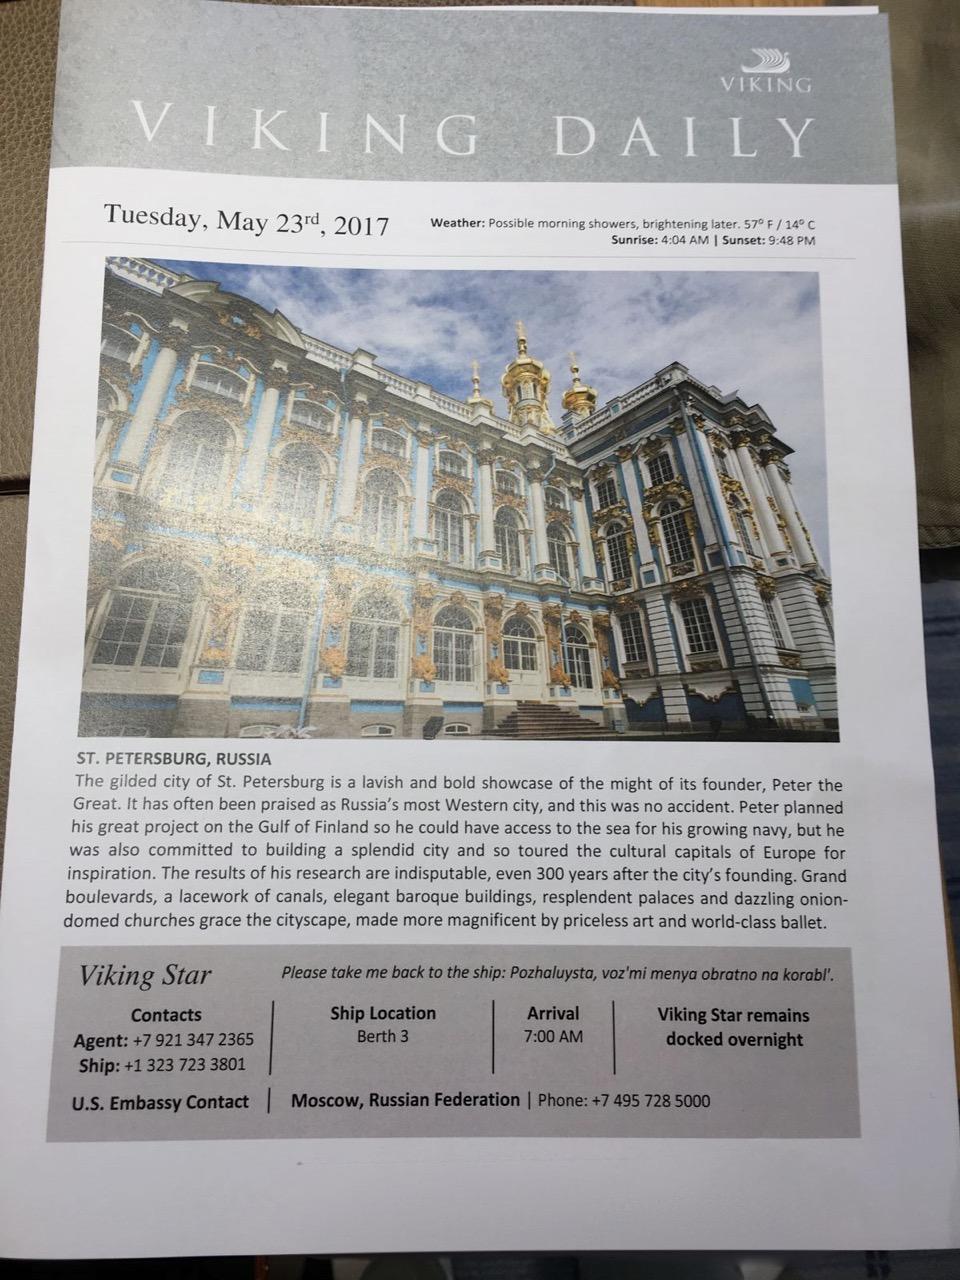 teri_st.petersburg_museums_cathedrals_travel_spiritedtable41.jpg